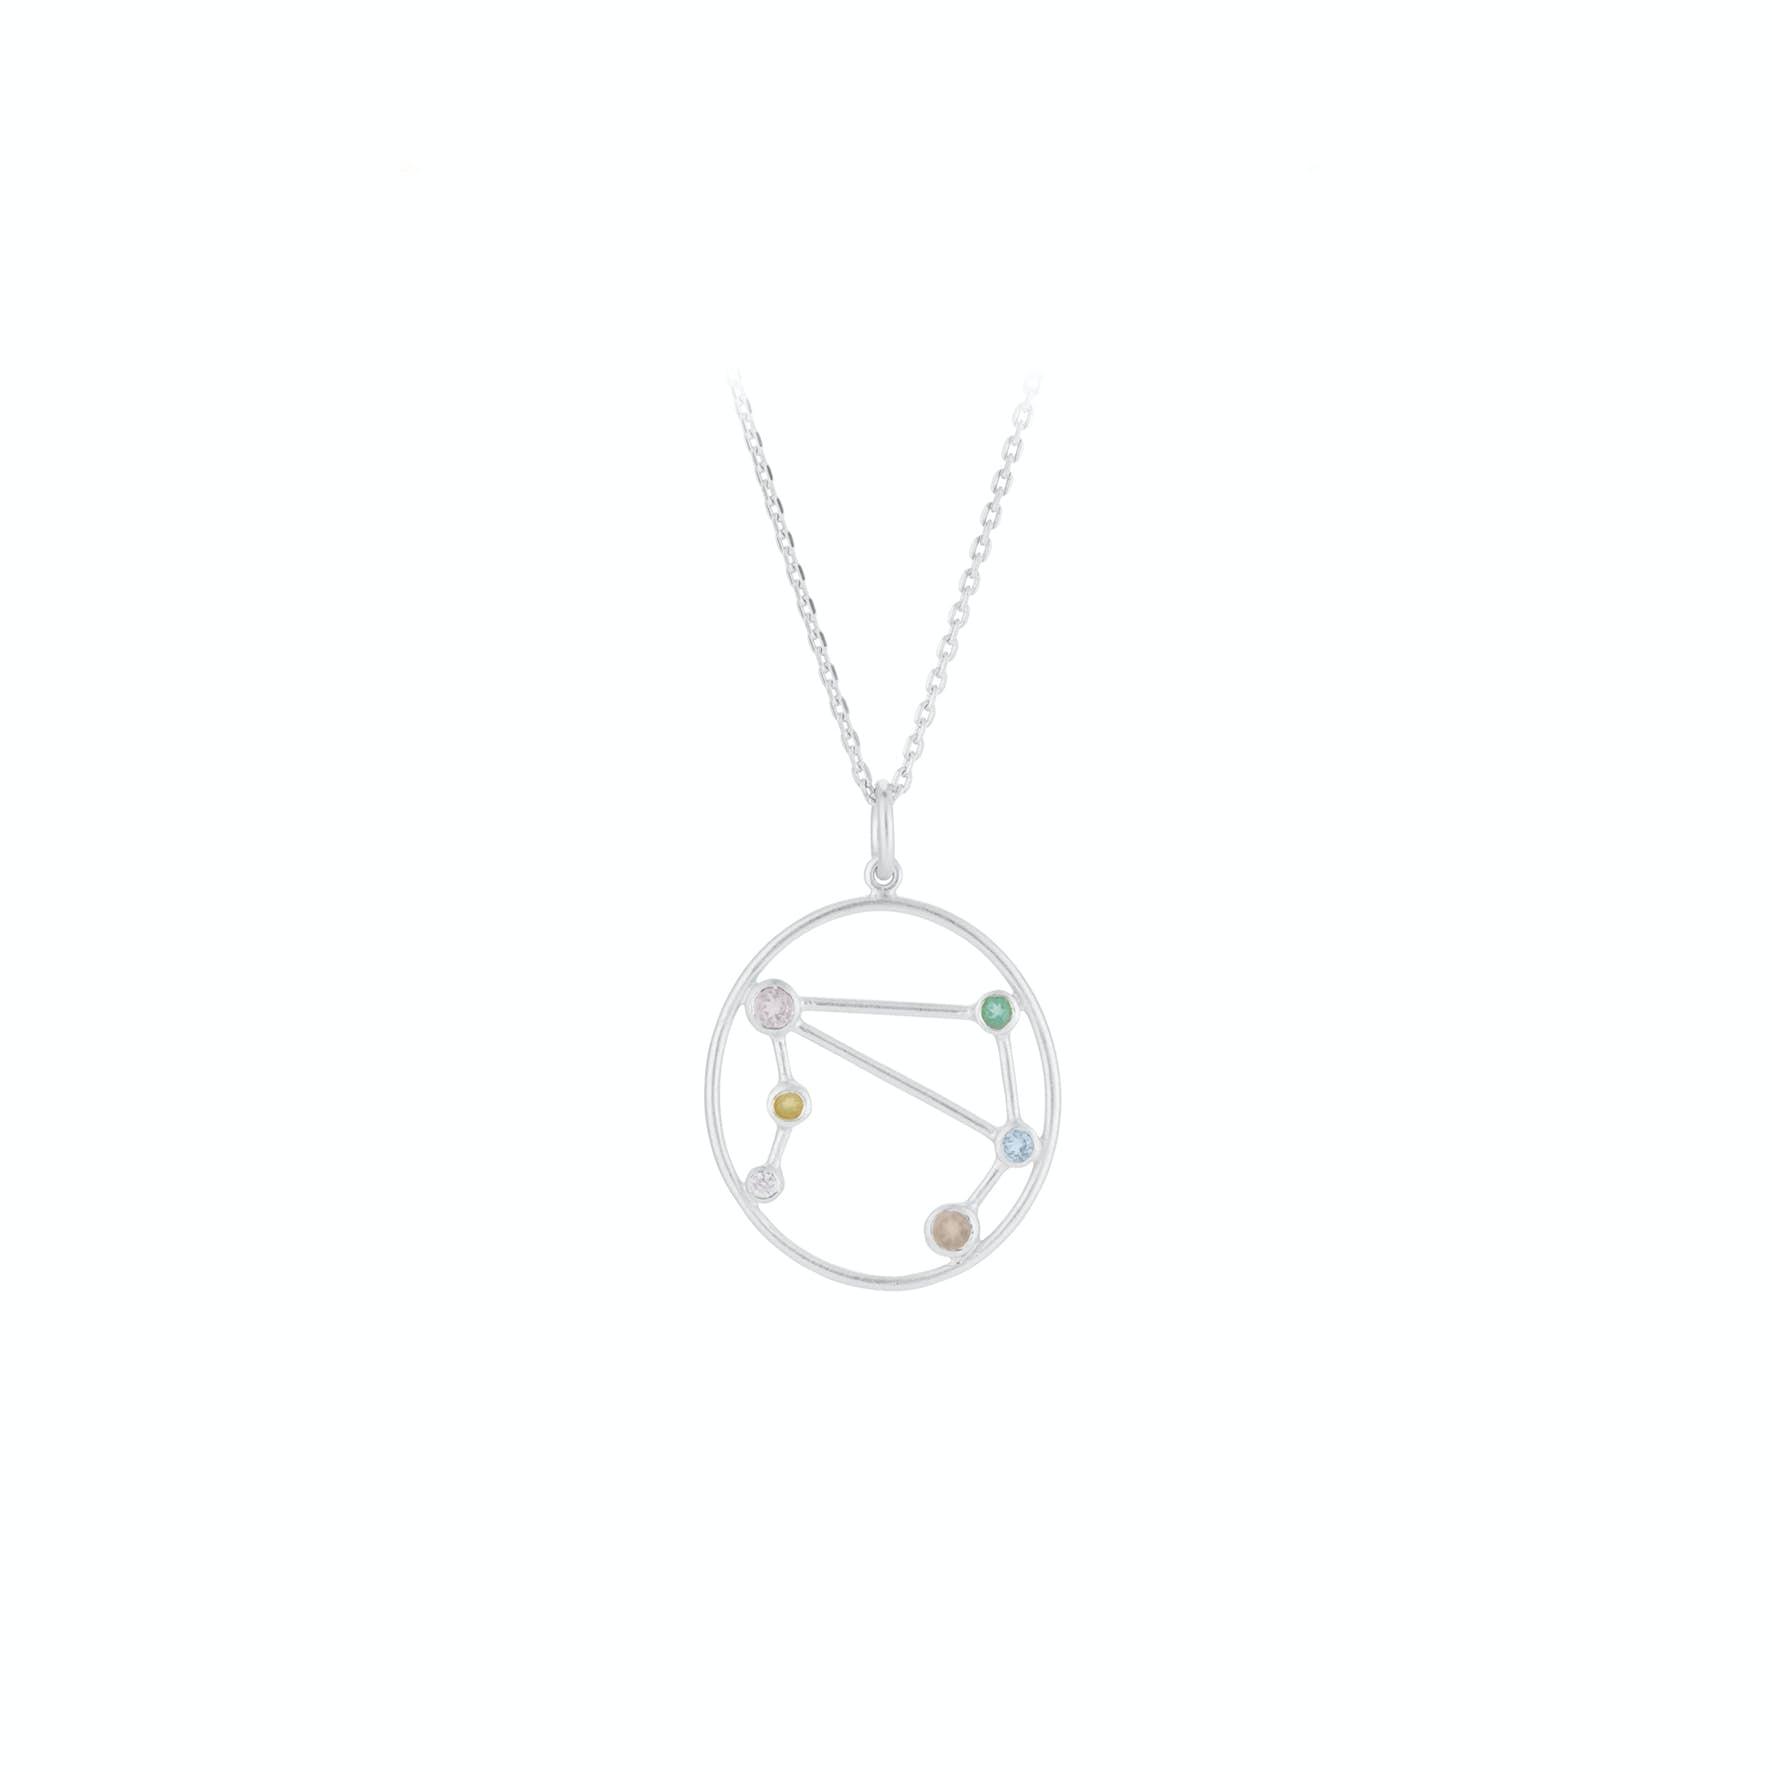 Zodiac Libra Necklace (Sep 23 - Oct 22) von Pernille Corydon in Silber Sterling 925